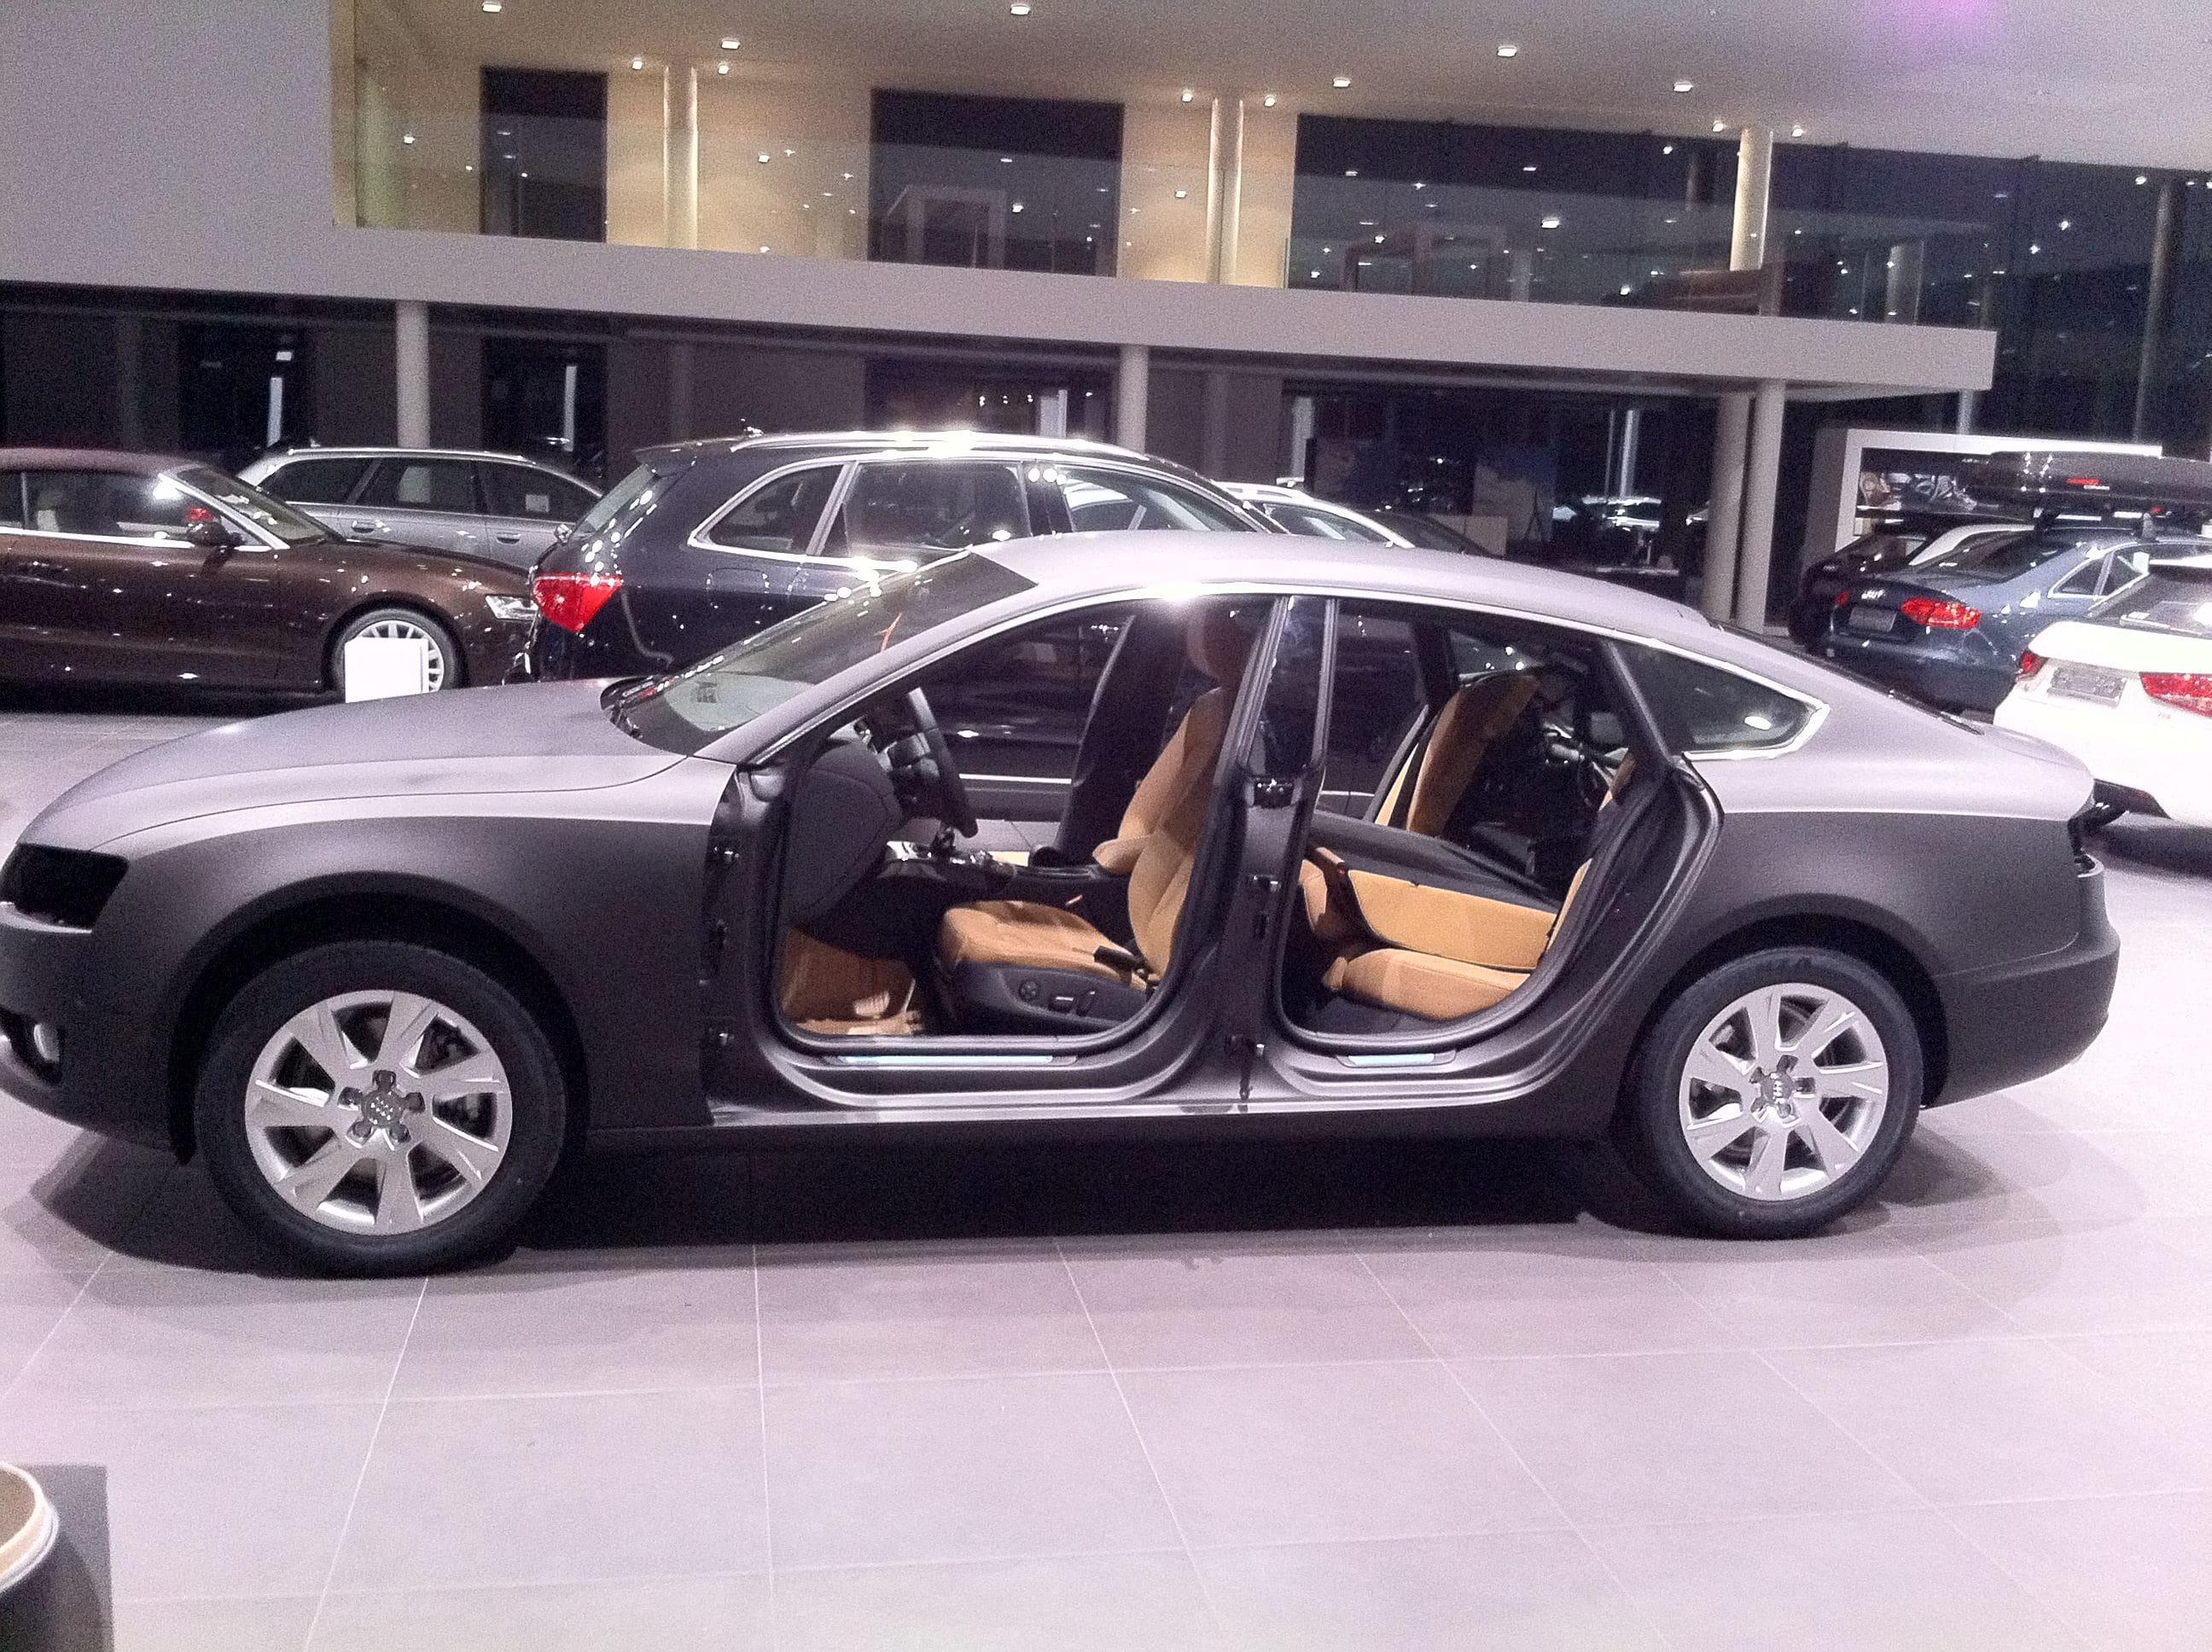 Audi A5 Sportback met Mat Grijze Wrap, Carwrapping door Wrapmyride.nu Foto-nr:4801, ©2021